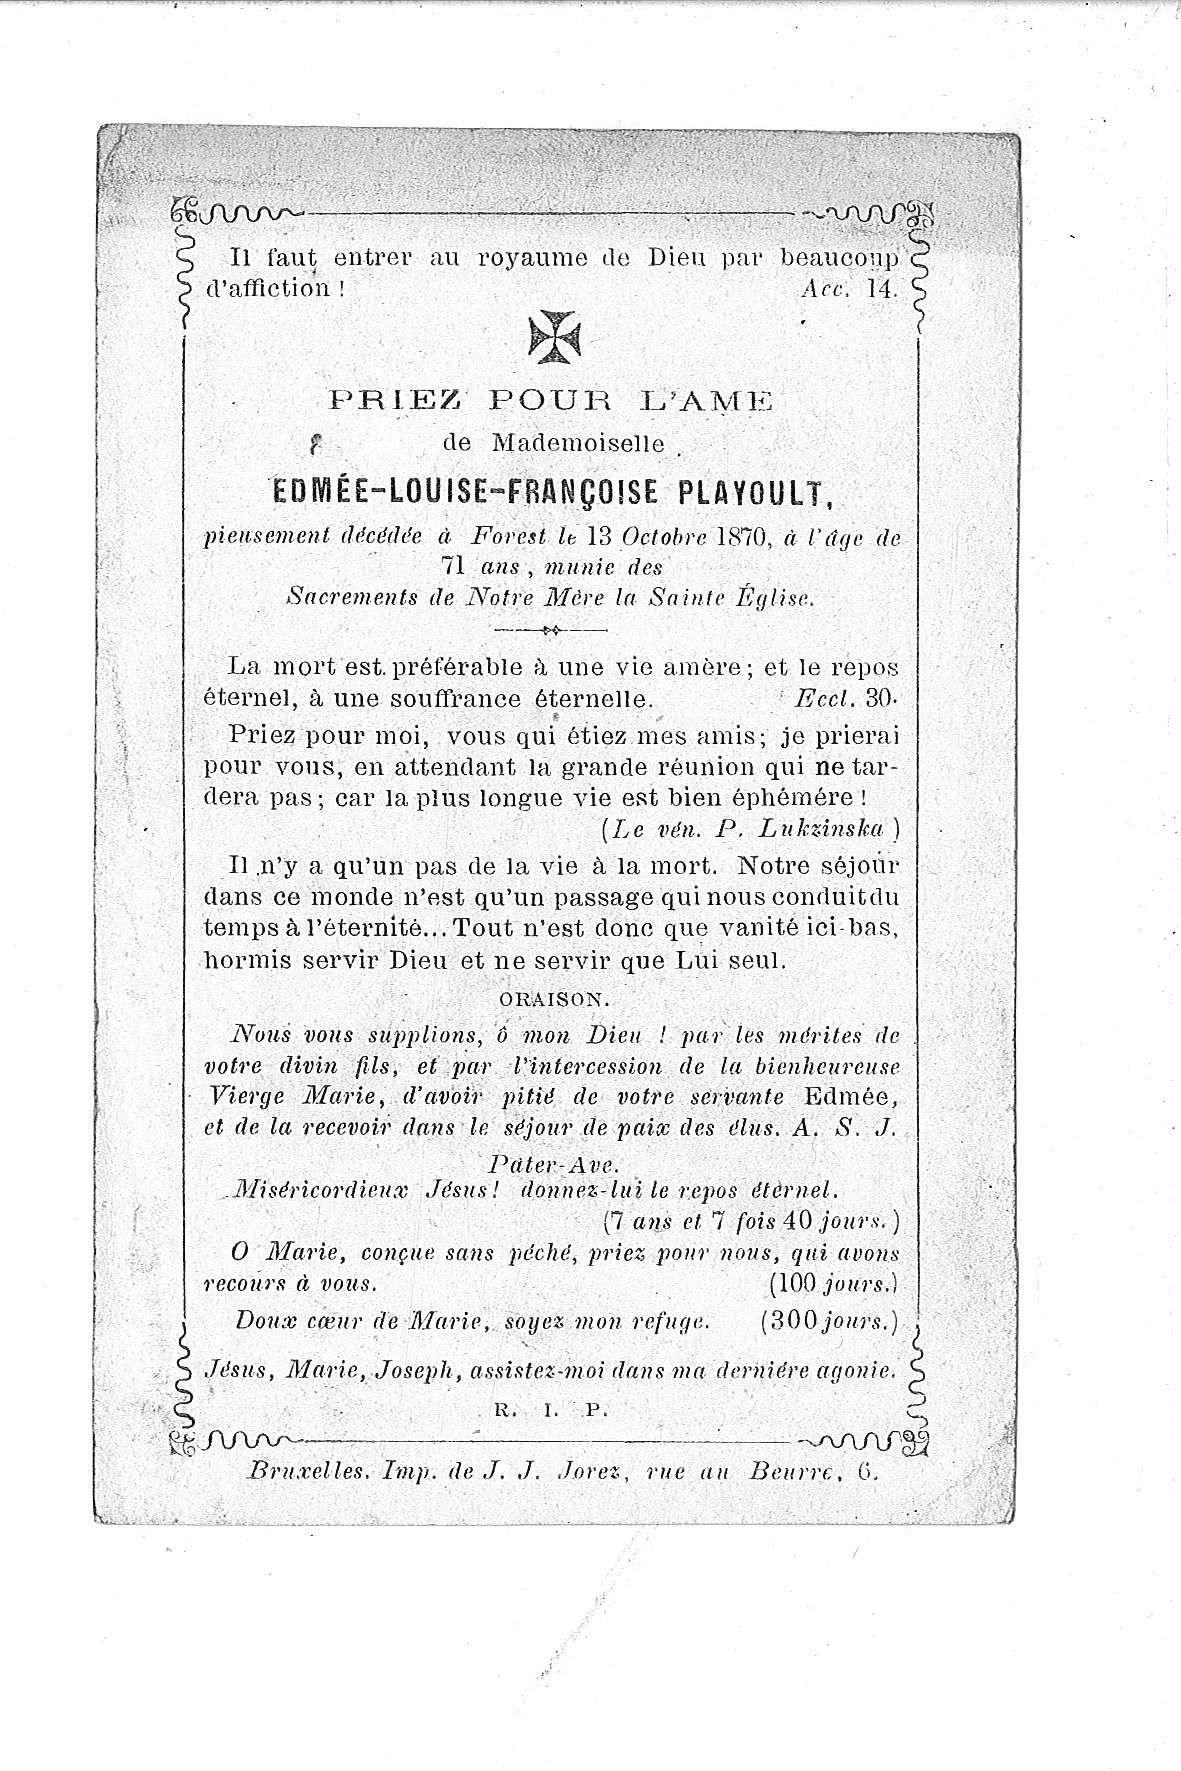 Edmée-Louise-Françoise(1870)20100415131555_00026.jpg